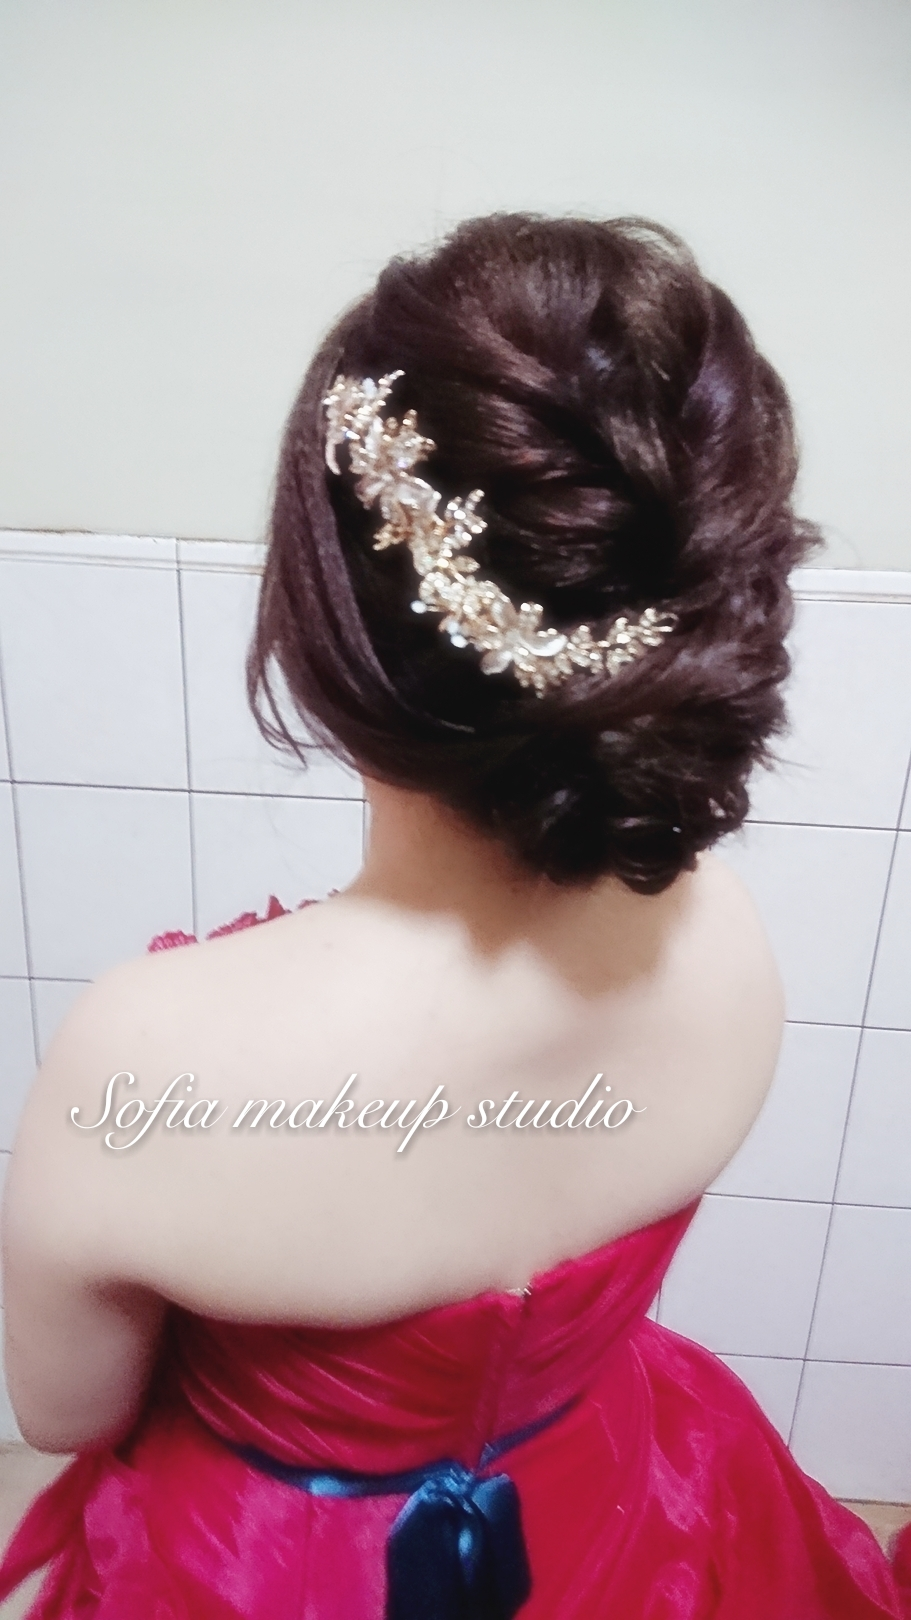 DSC_1877_mr1512476512108_mh1512527872469 - Sofia makeup studio - 結婚吧